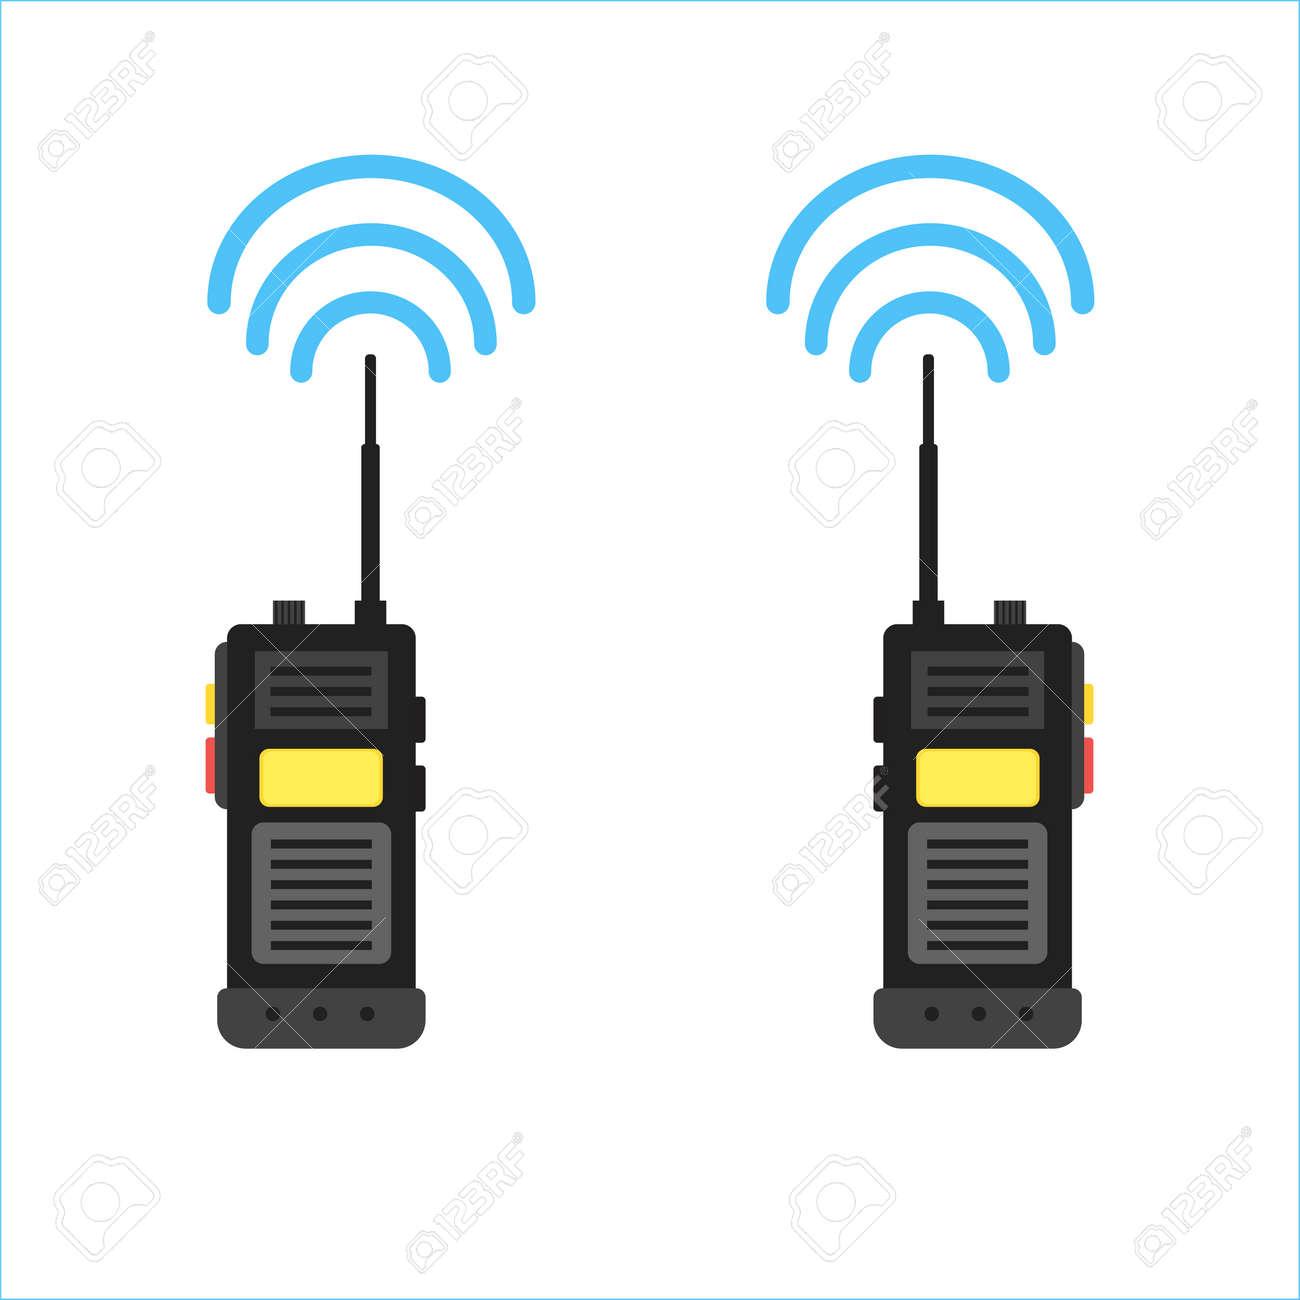 walkie talkie icon. police radio online - 61453597